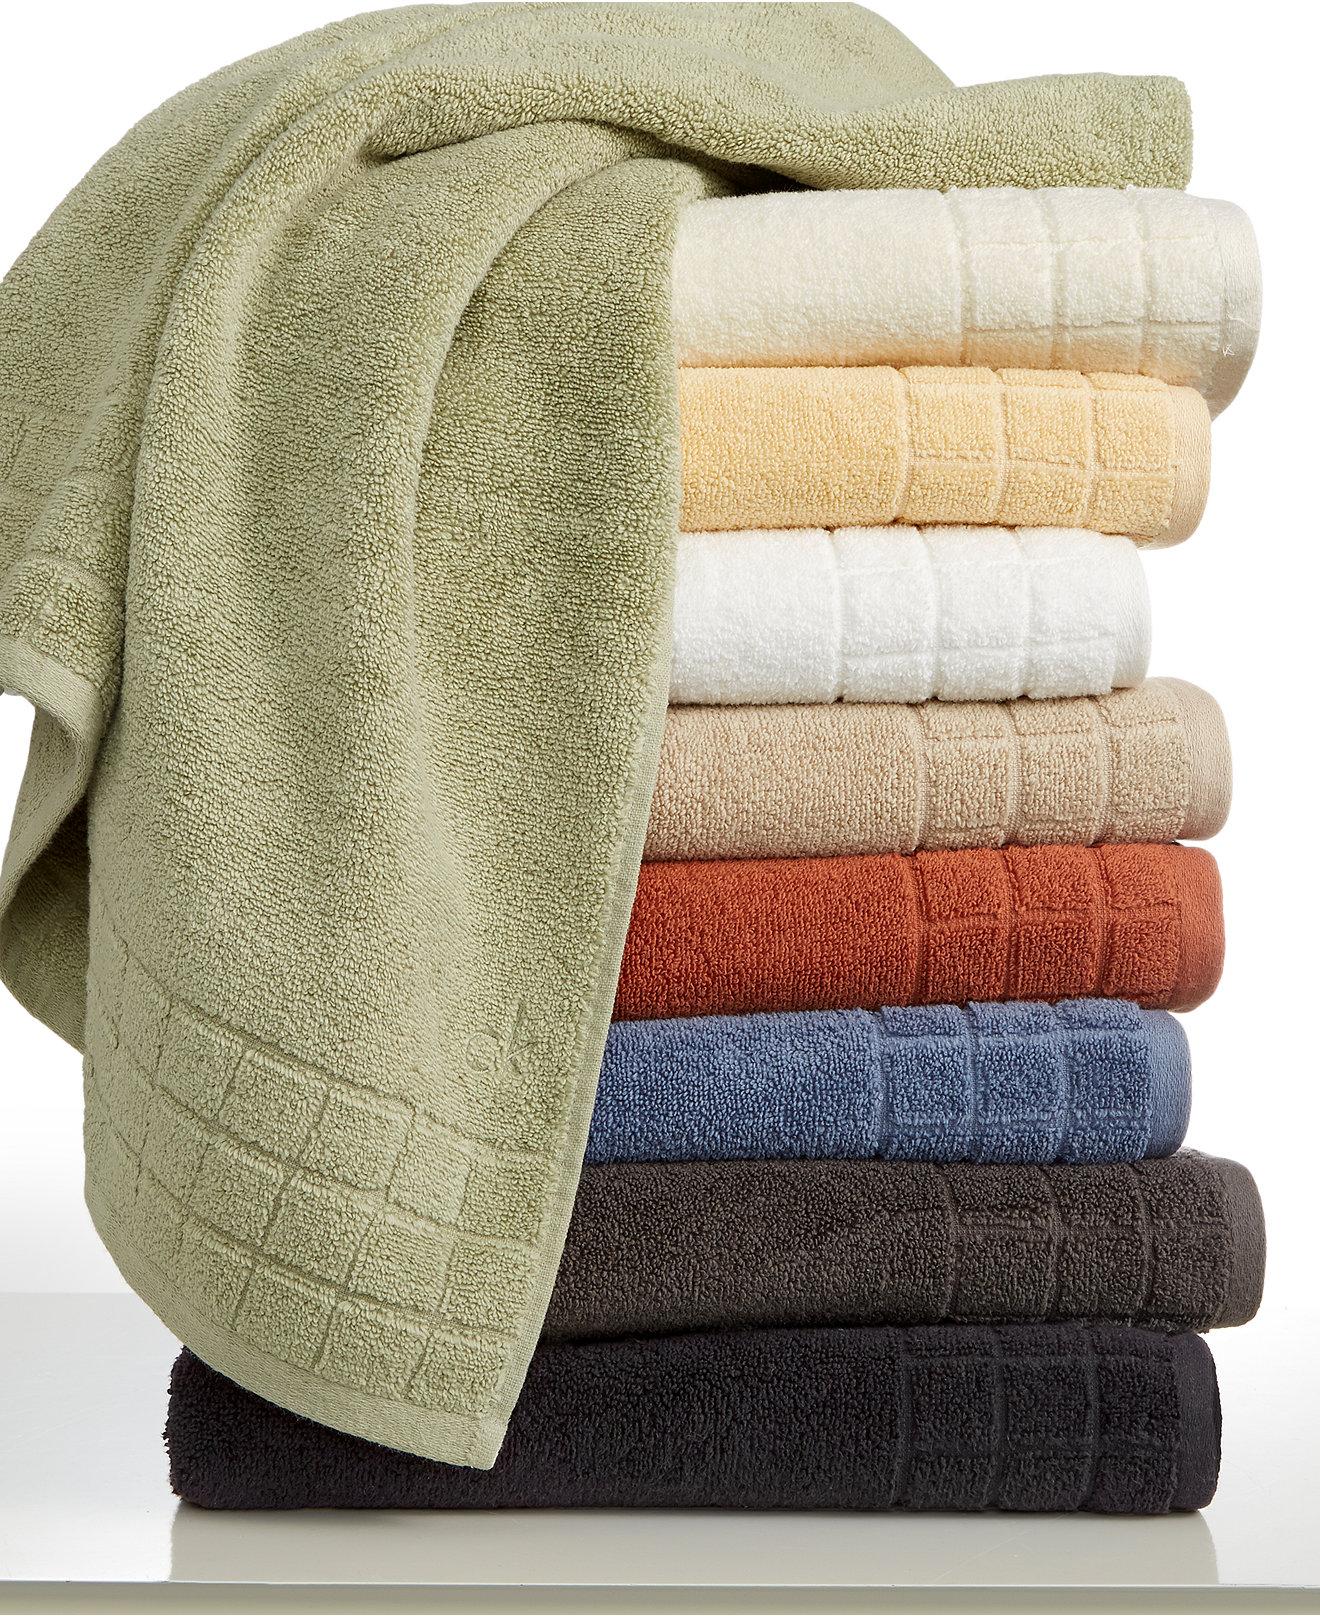 Peacock bathroom towels - Calvin Klein Sculpted Grid Bath Towel Collection Bath Towels Bed Bath Macy S